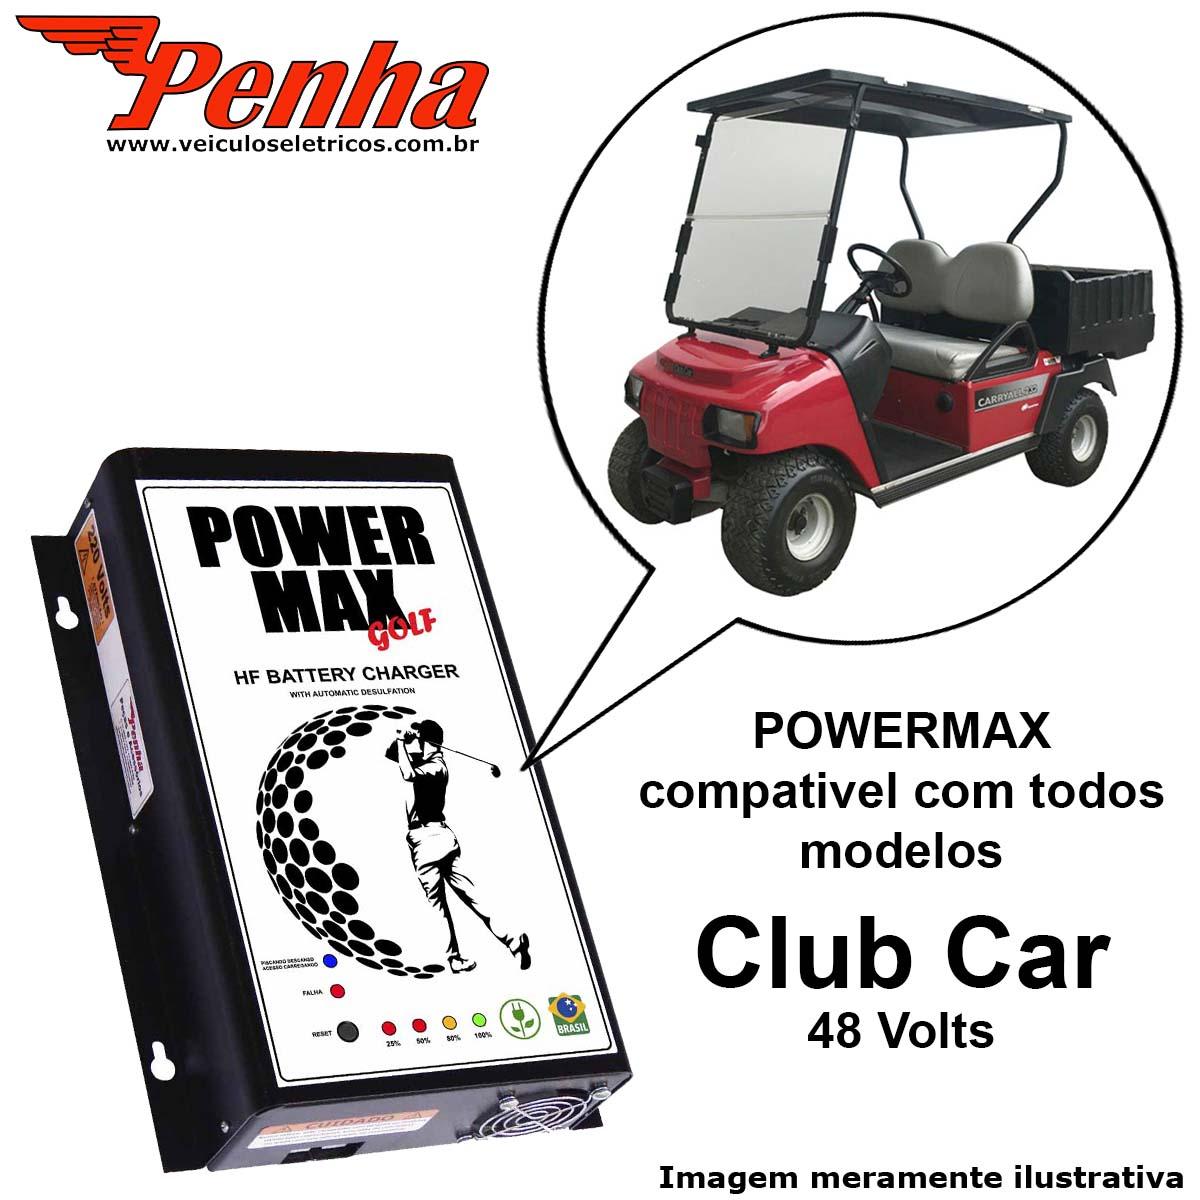 Carregador de Baterias para golf cart Club Car 48 Volts